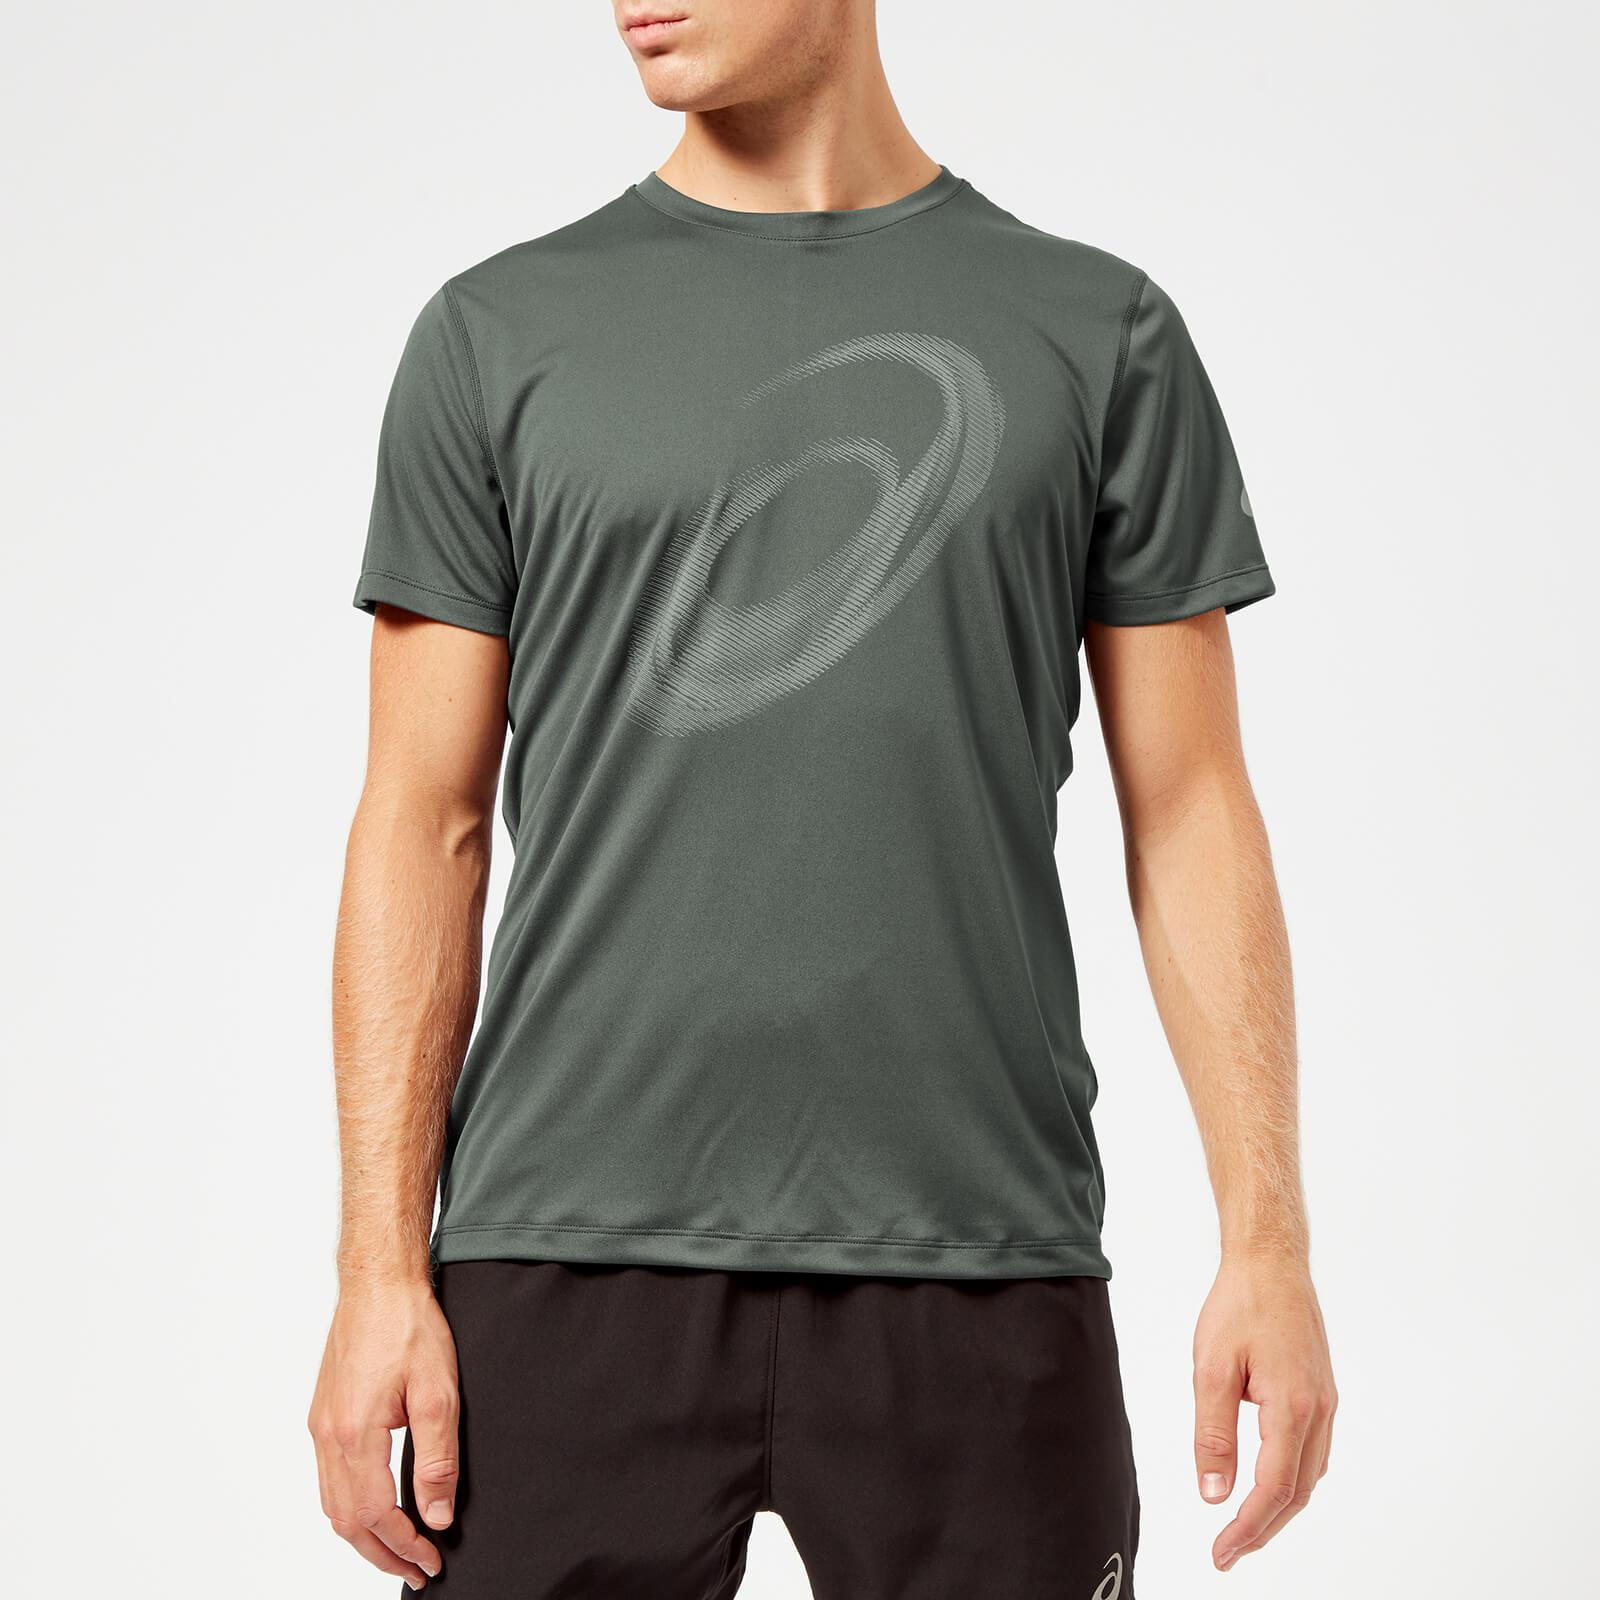 09799727 Asics Men's Silver Short Sleeve Graphic Top - Dark Grey